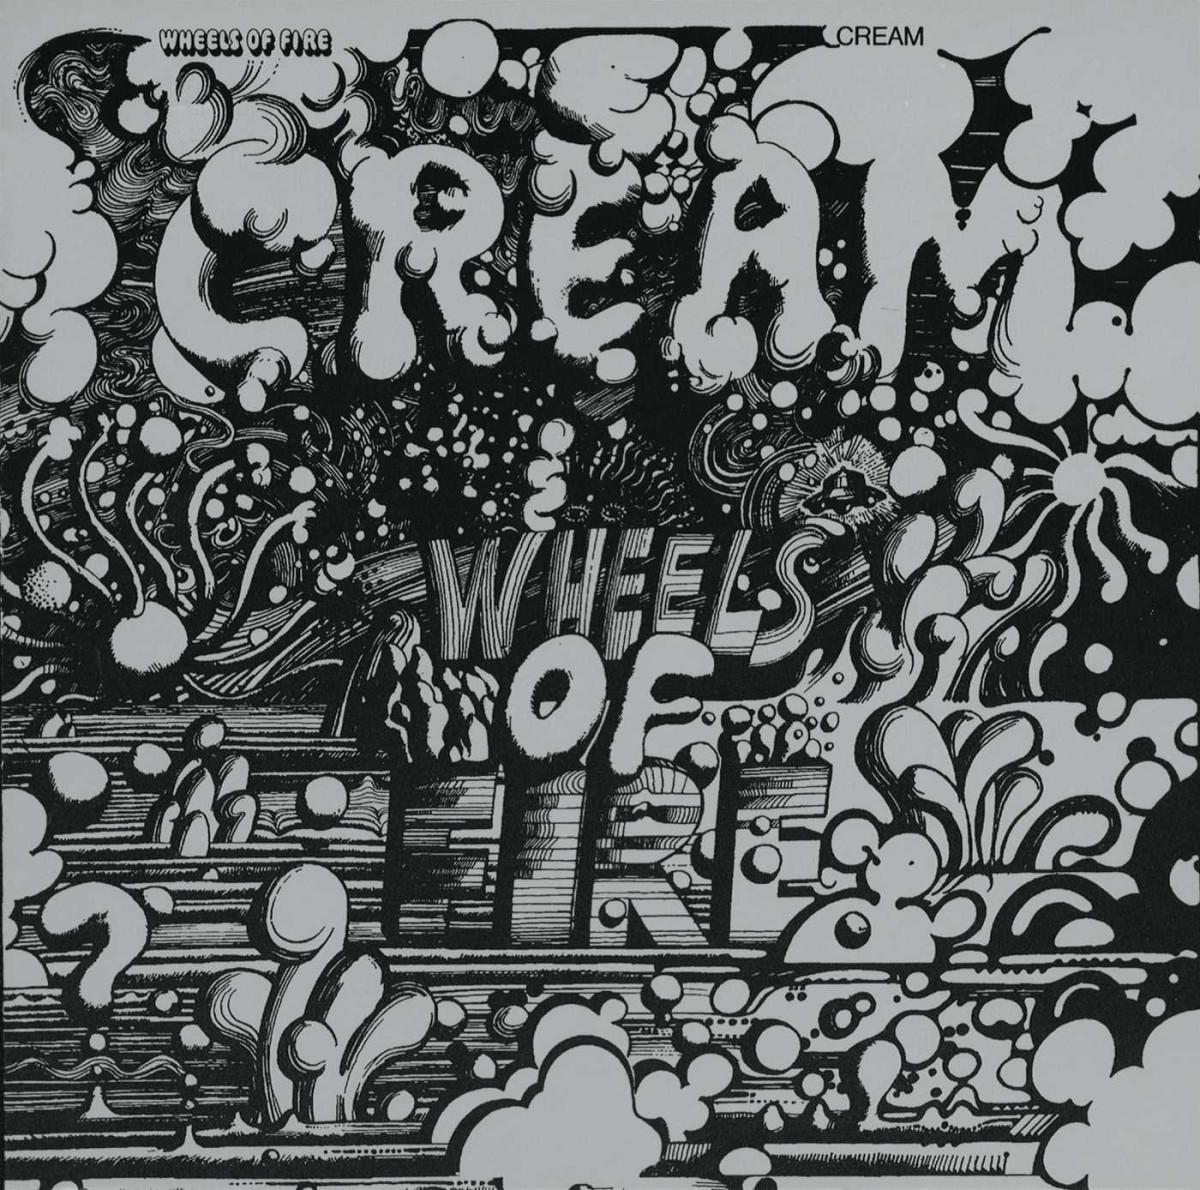 Cream, Wheels of Fire